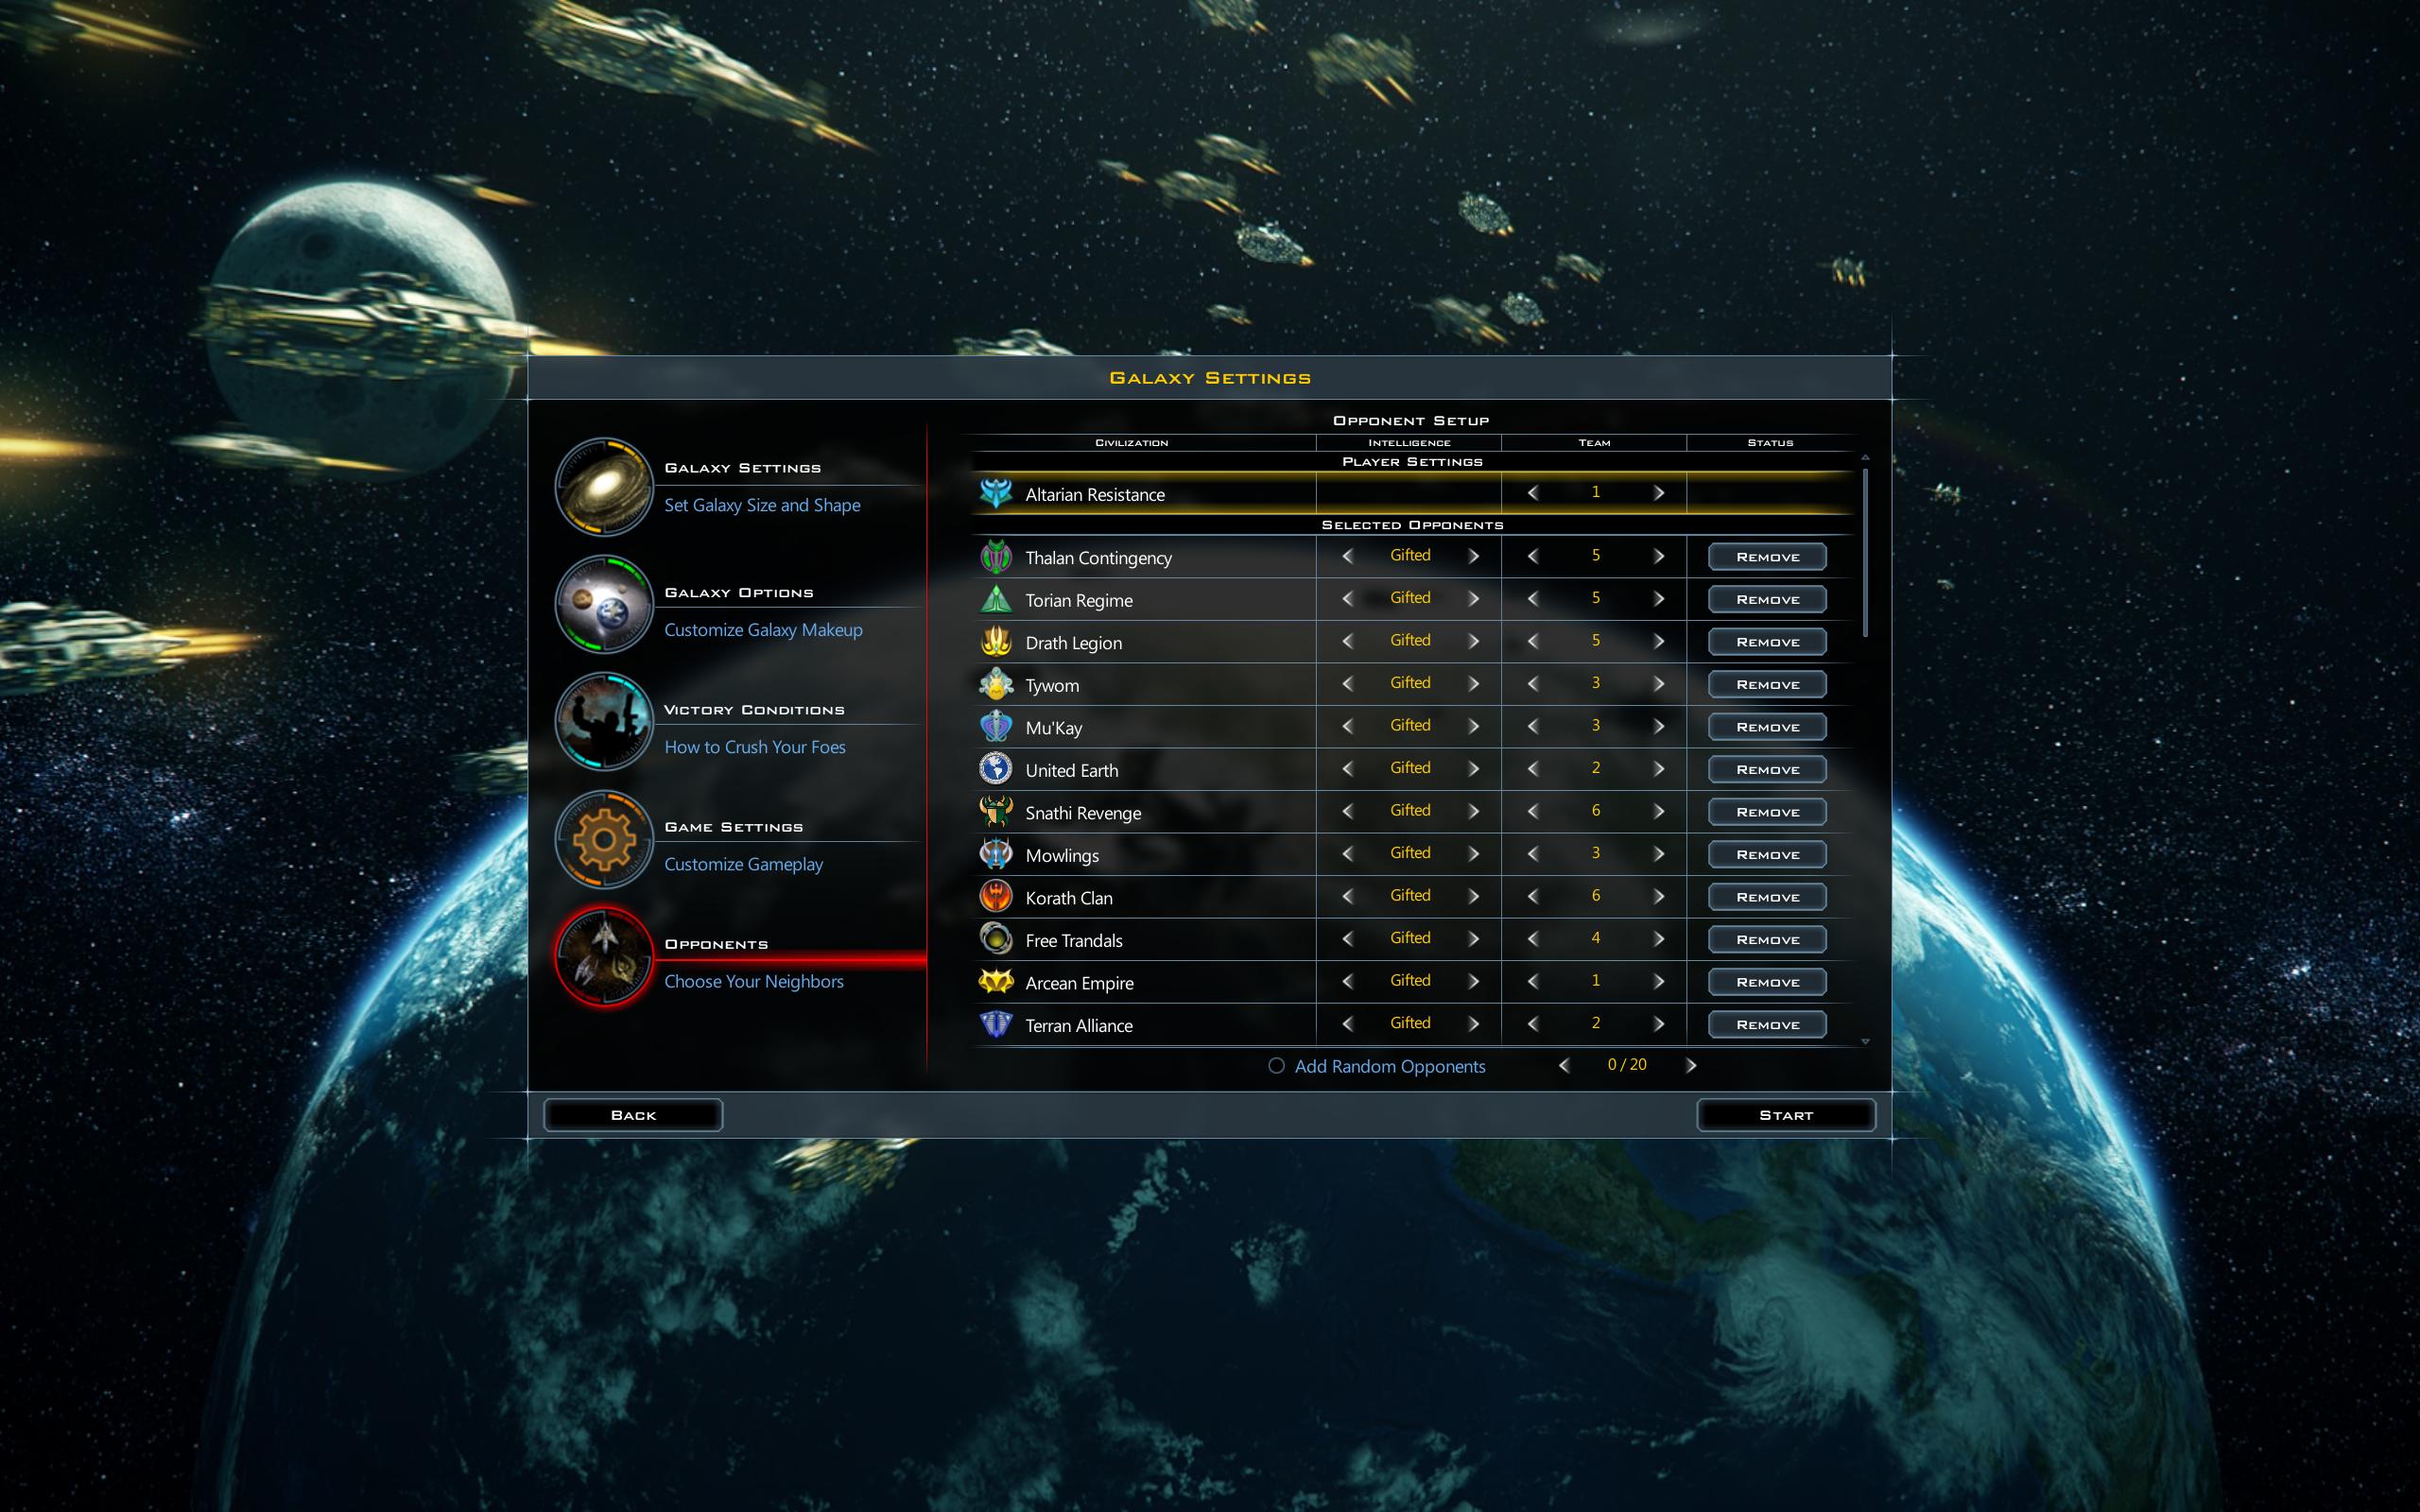 Galactic Civilizations III: Ascension